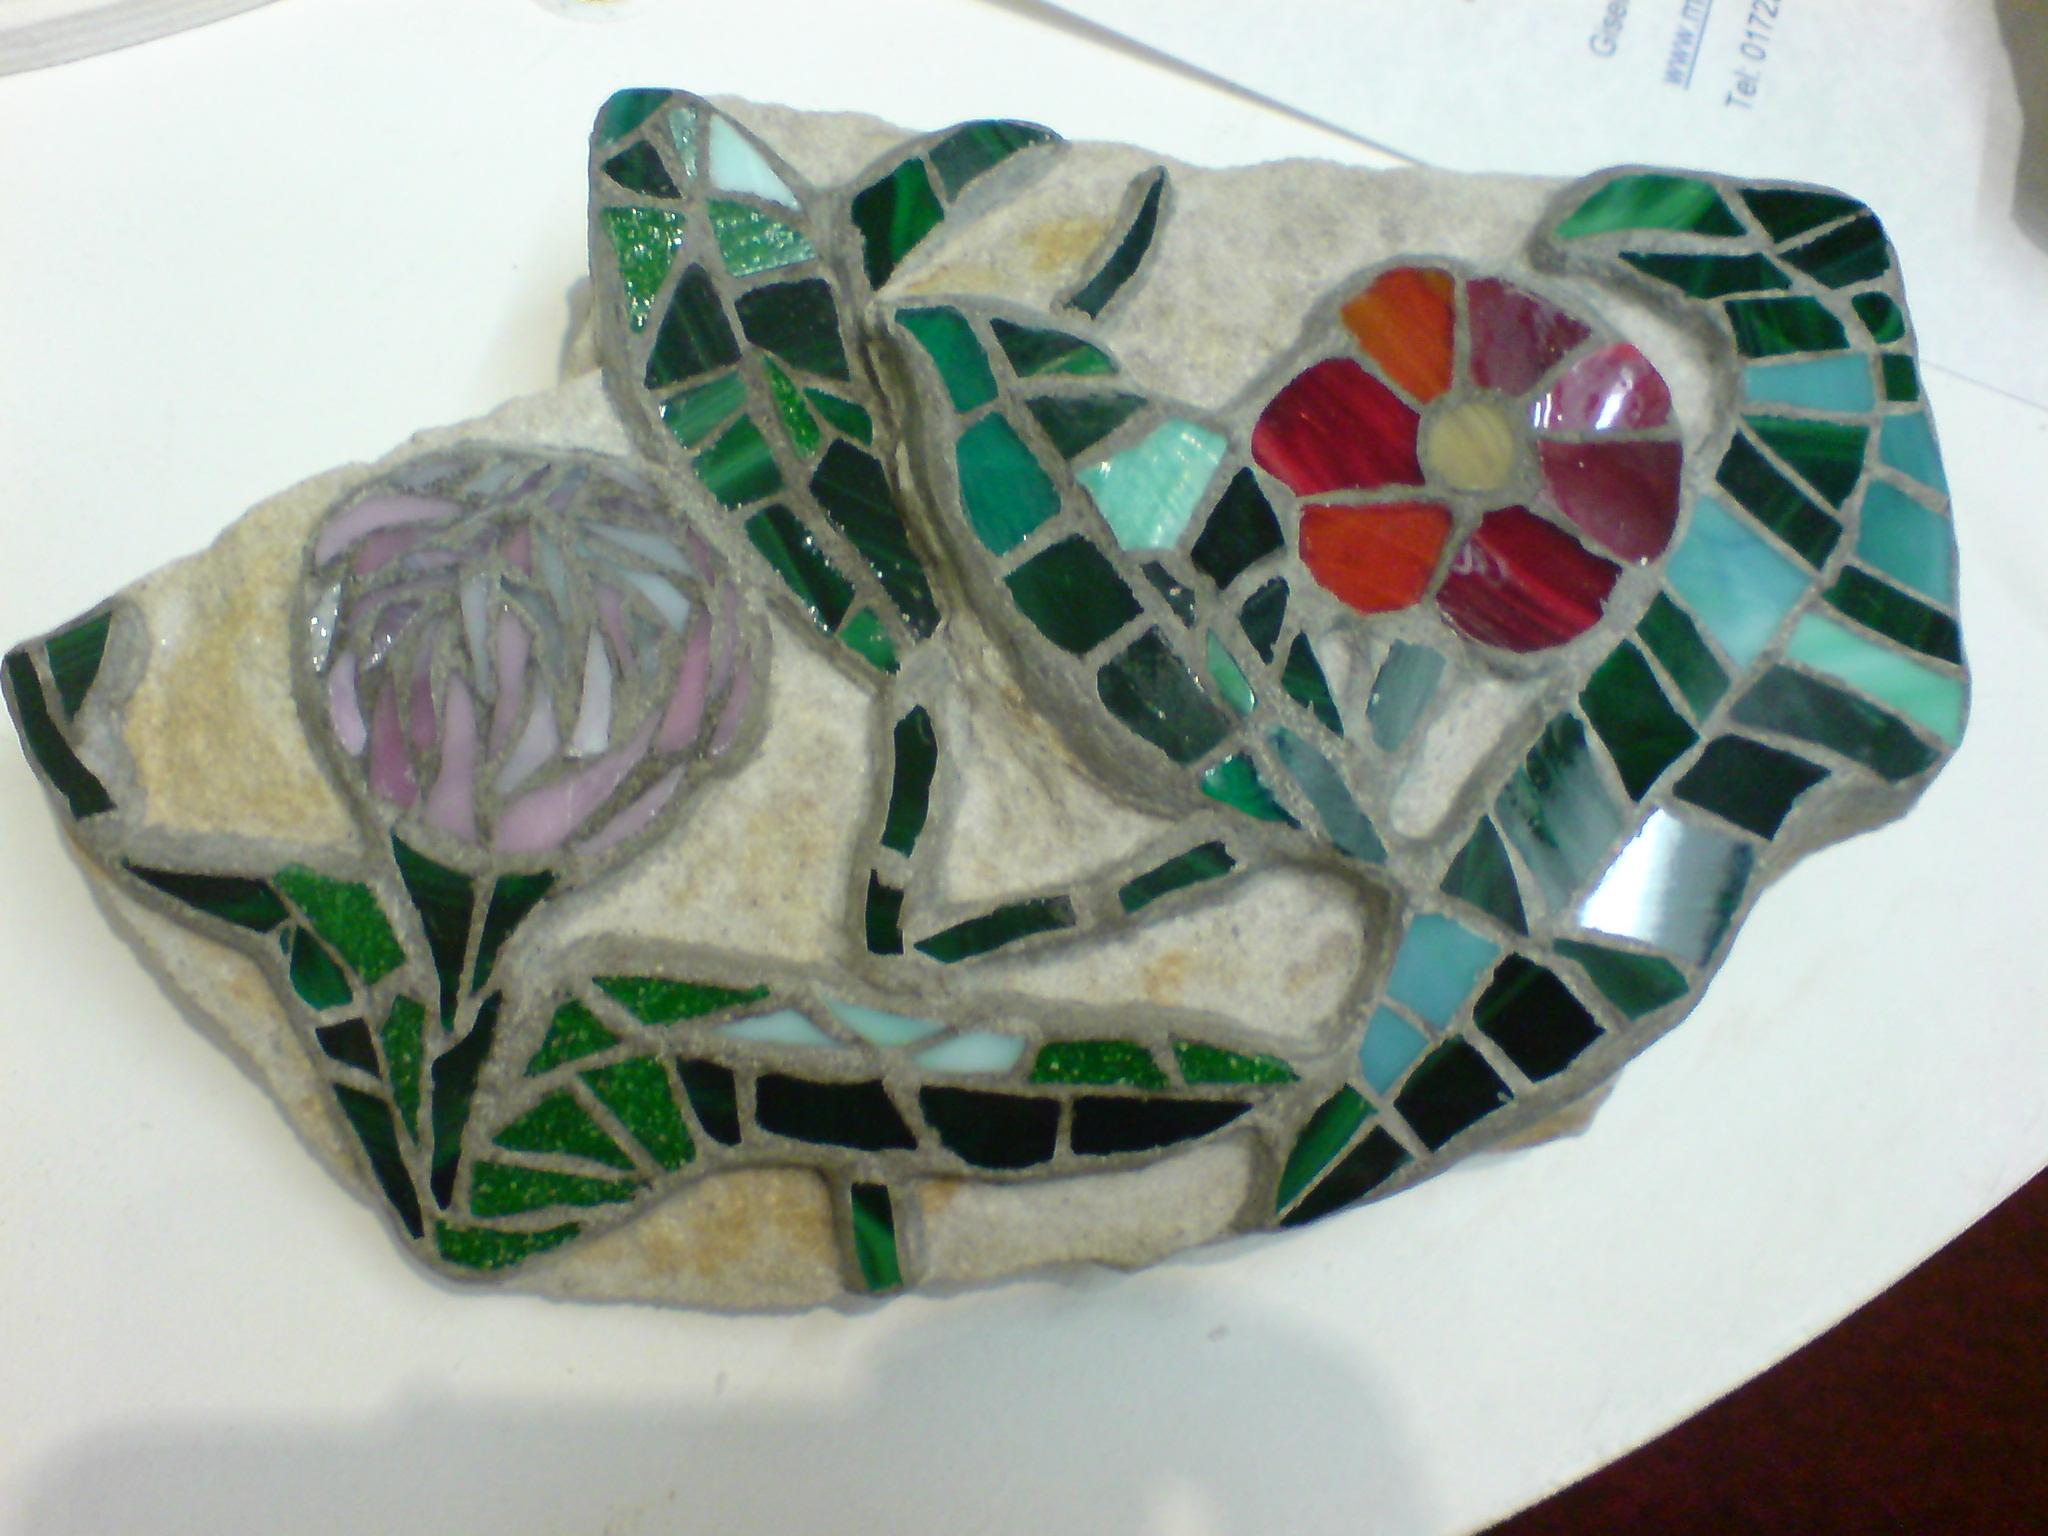 Flowers on a Rock, Gisela Gibbon Mosaic Artist, Scarborough